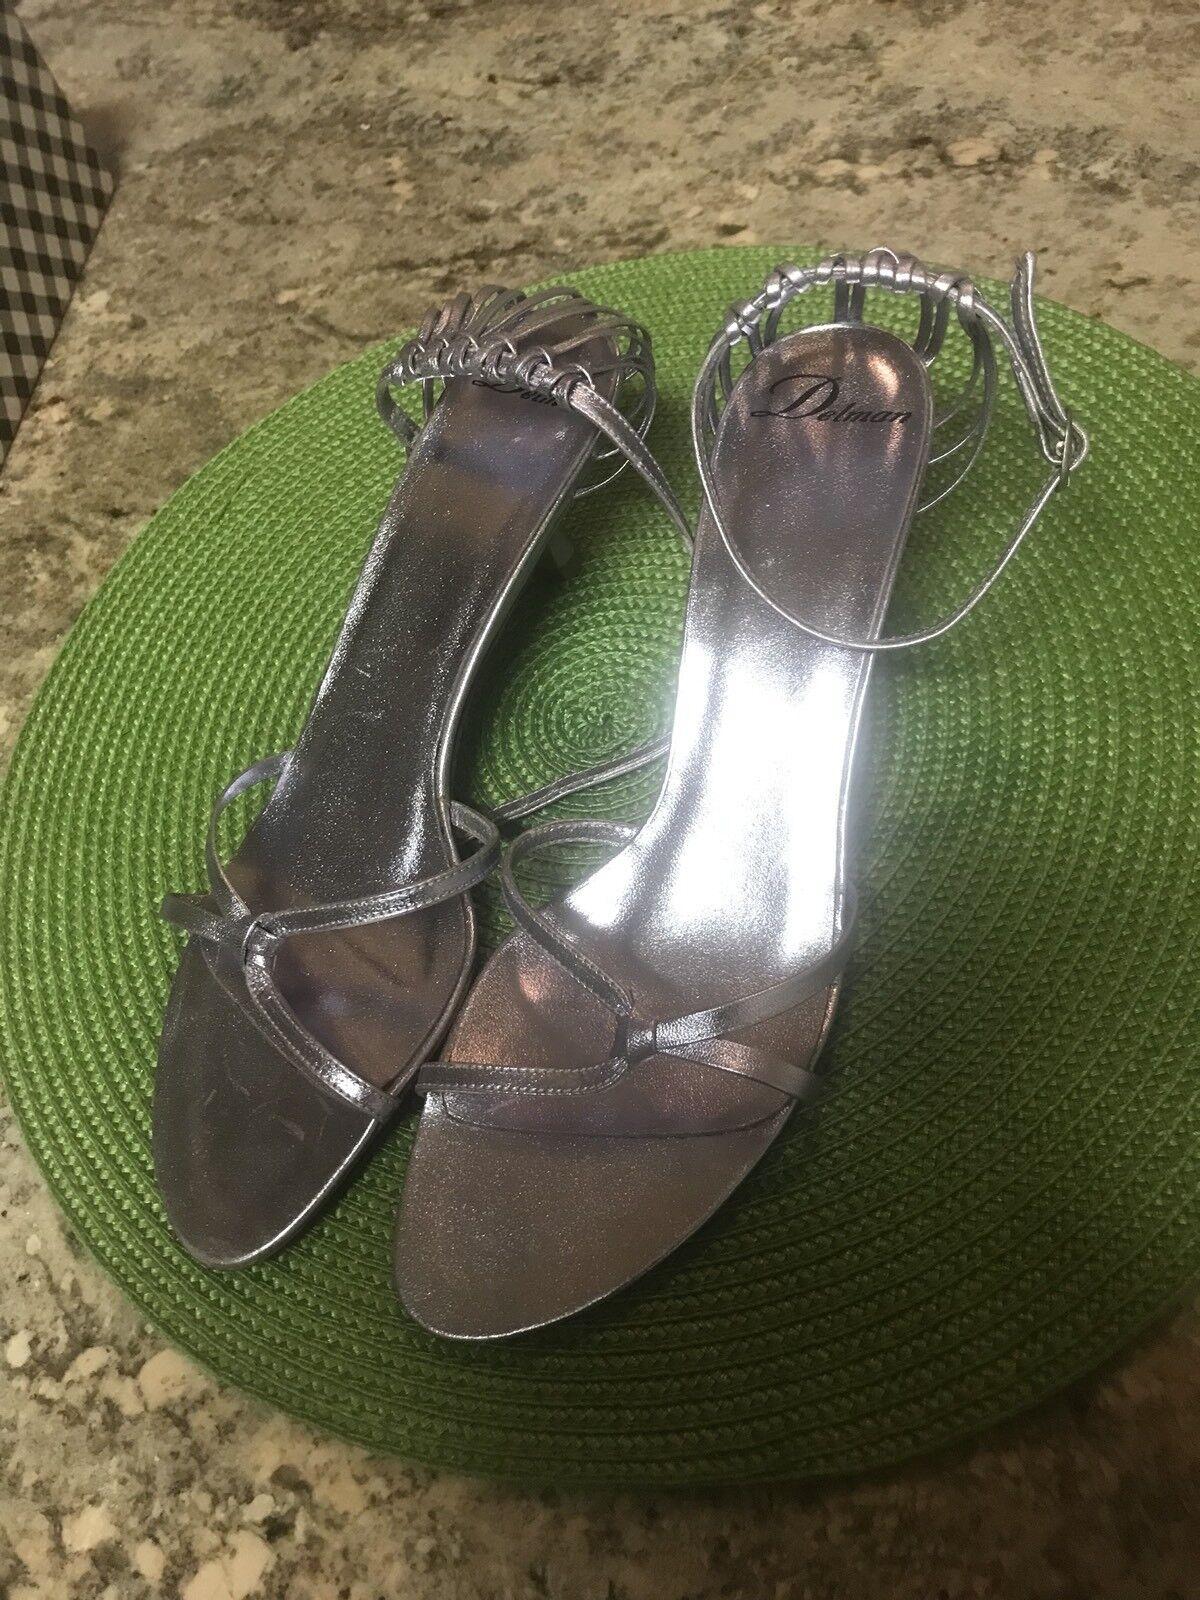 DELMAN WOMEN Schuhe  (CAFE-MN)  LAVENDER METAL  FROM  SAK    FROM SIZE 8.5 c0d8ff